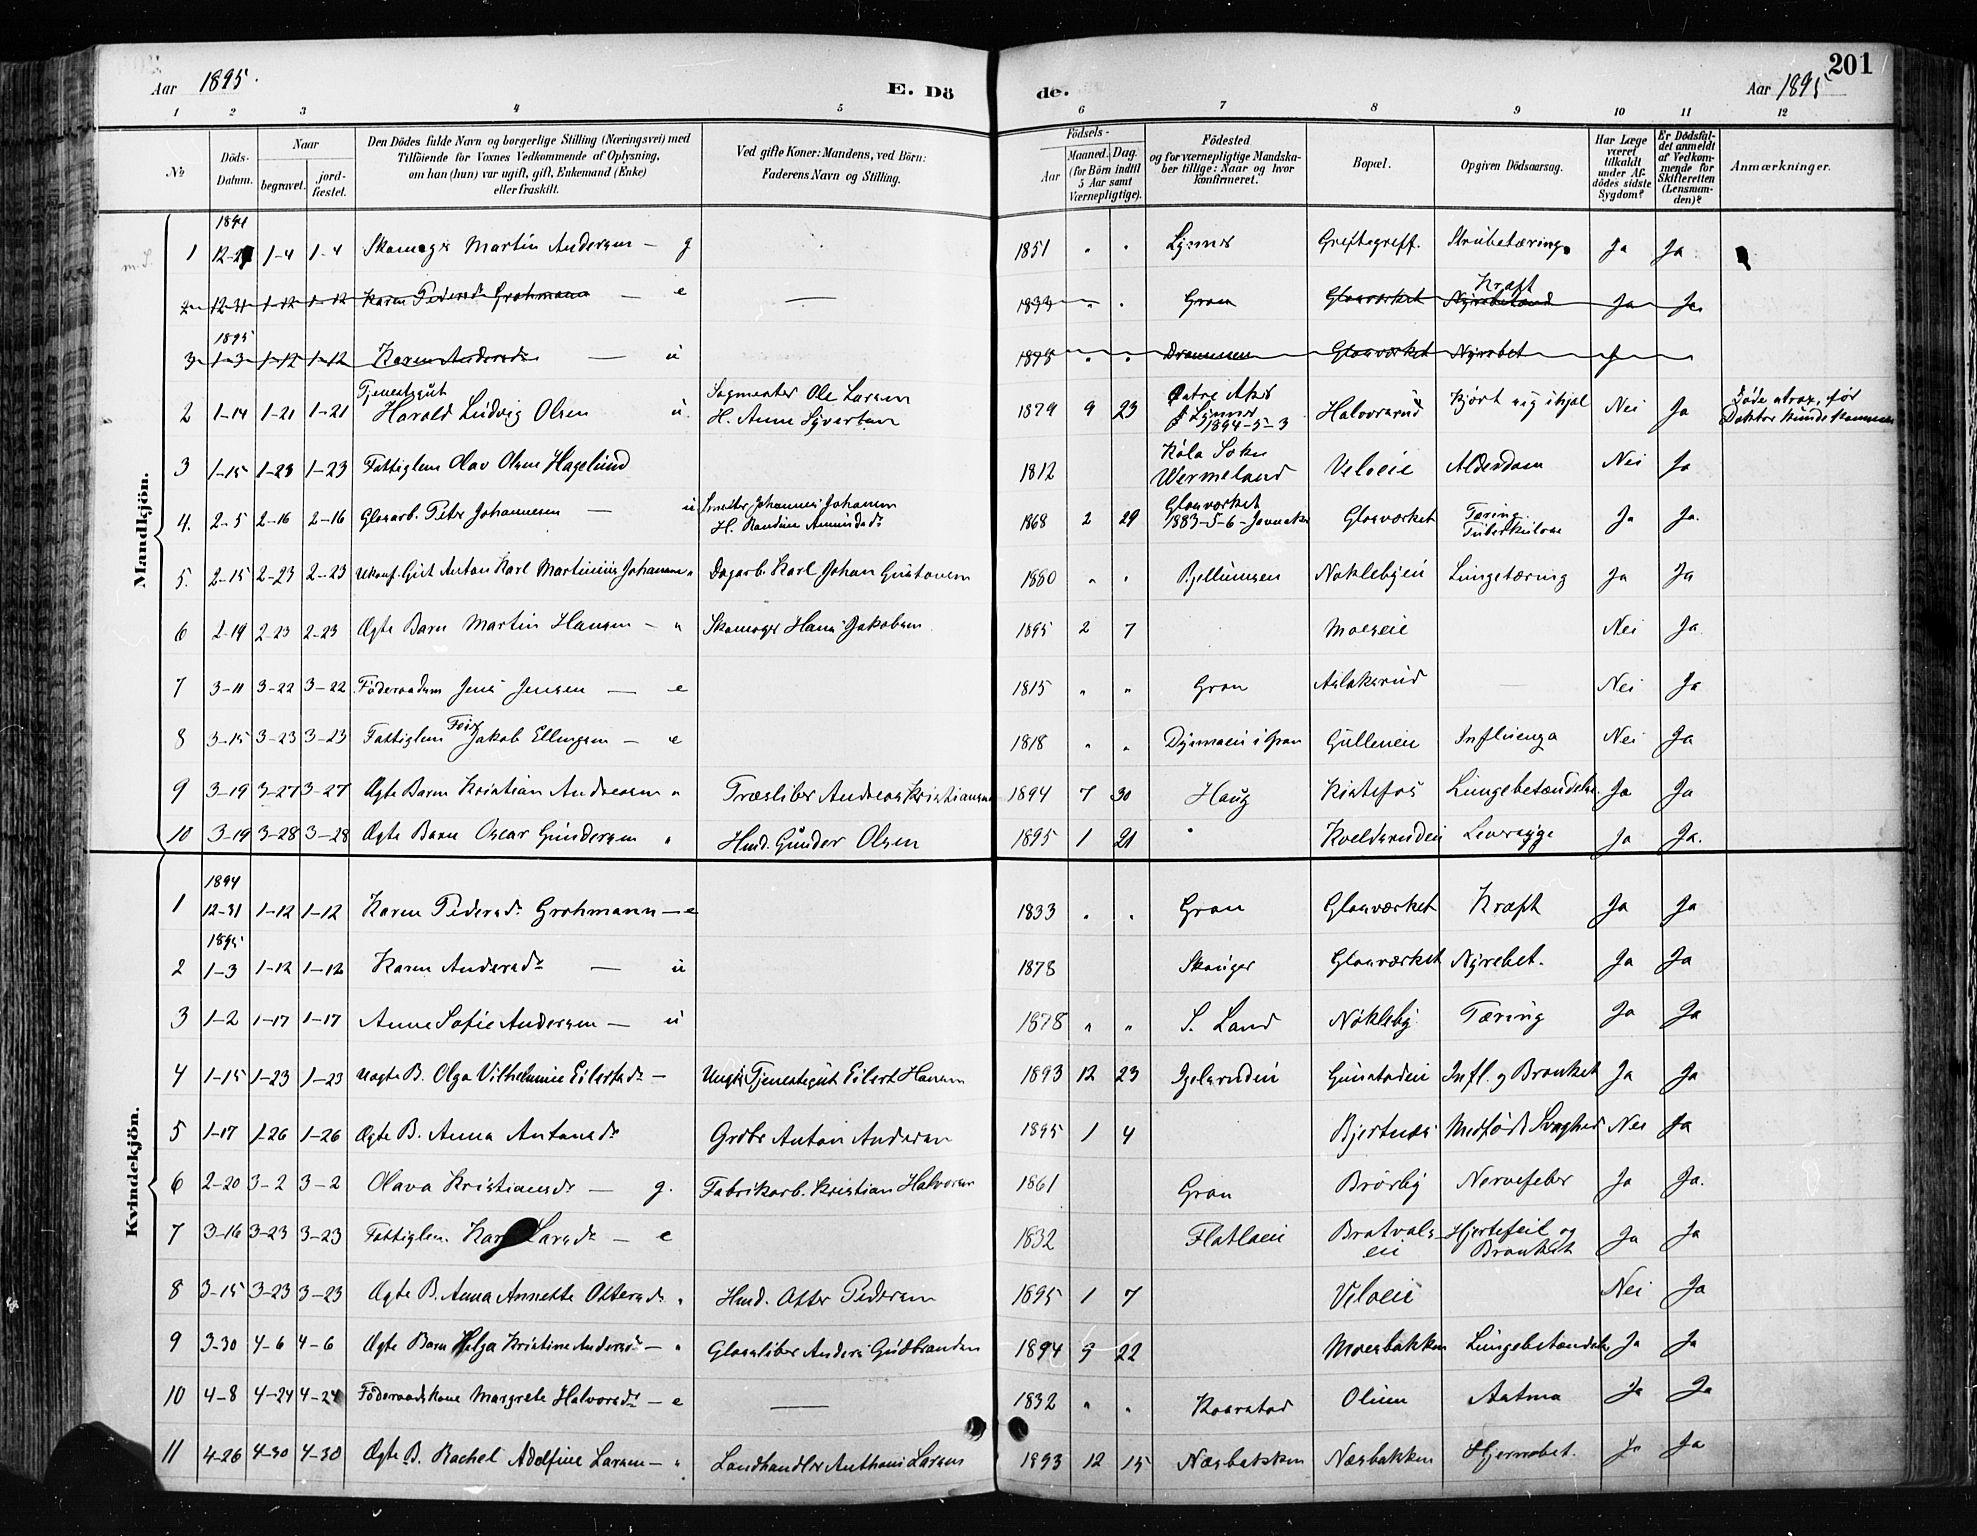 SAH, Jevnaker prestekontor, Ministerialbok nr. 9, 1891-1901, s. 201